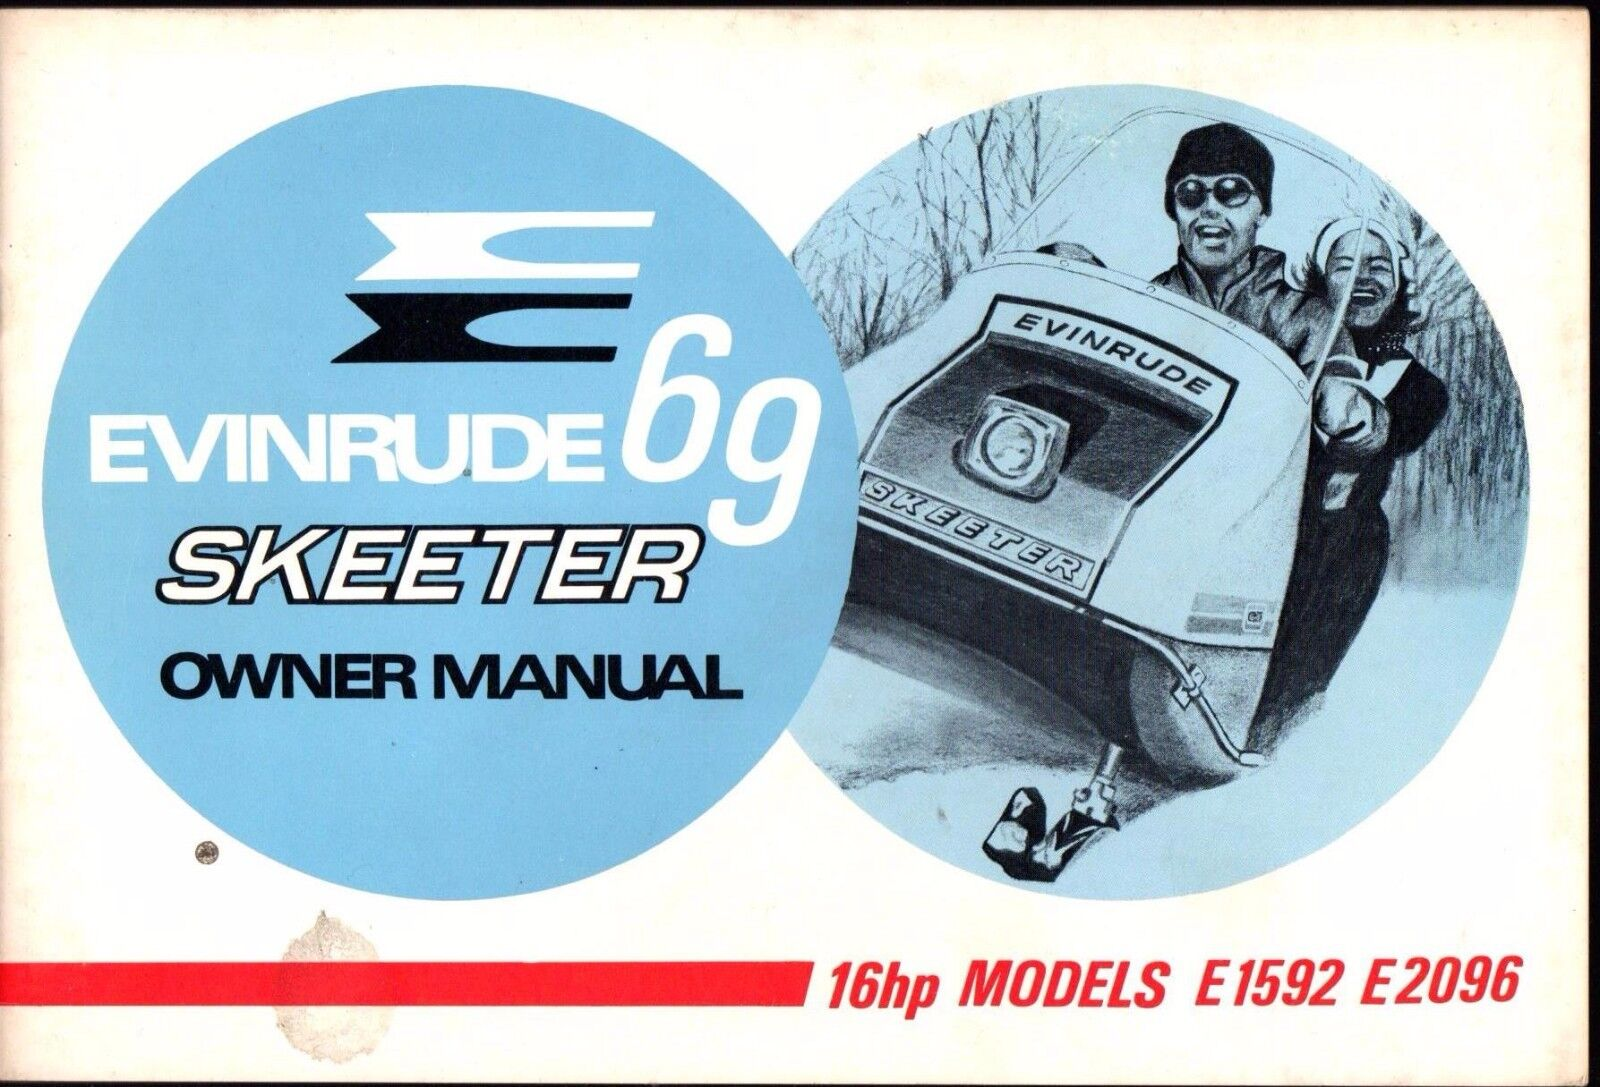 1969 EVINRUDE SKEETER 16HP MODELS E1592 & E2096 SNOWMOBILE OWNERS MANUAL (801)